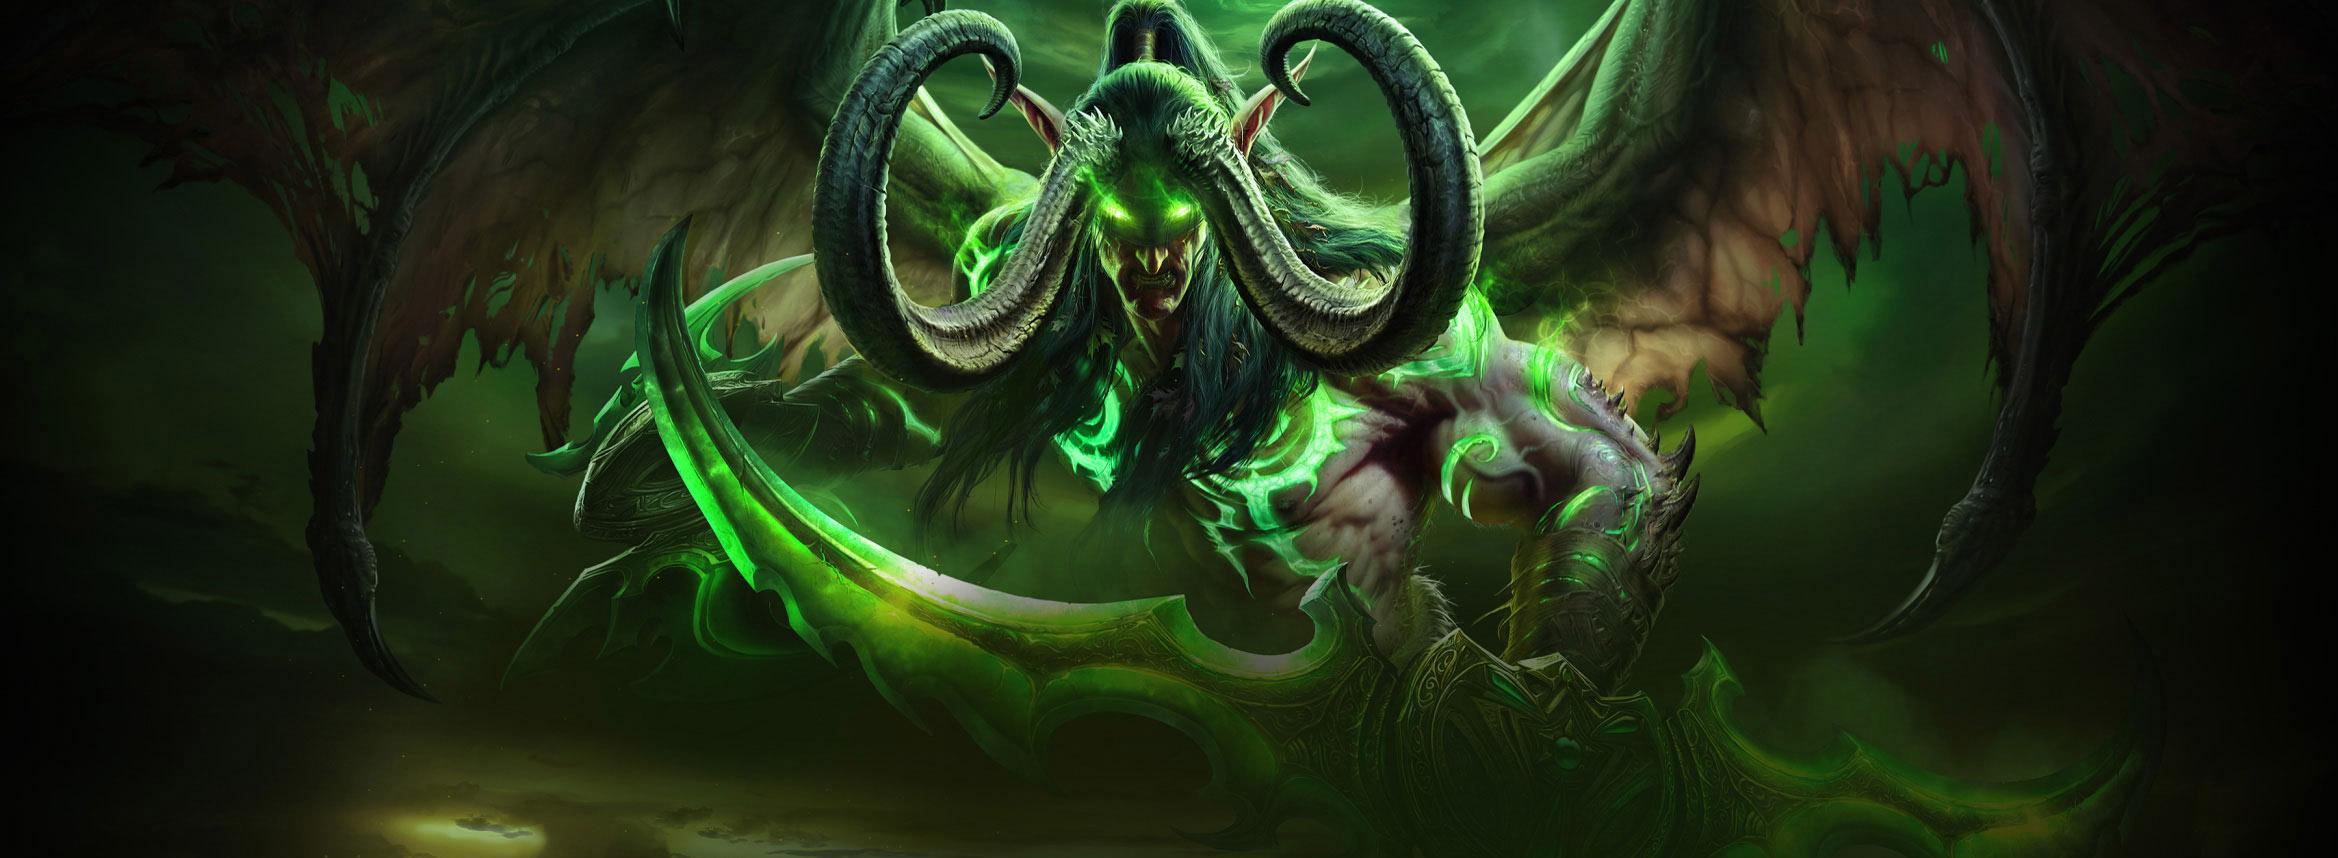 World Of Warcraft Legion Wrap Up Ckalebdotcom